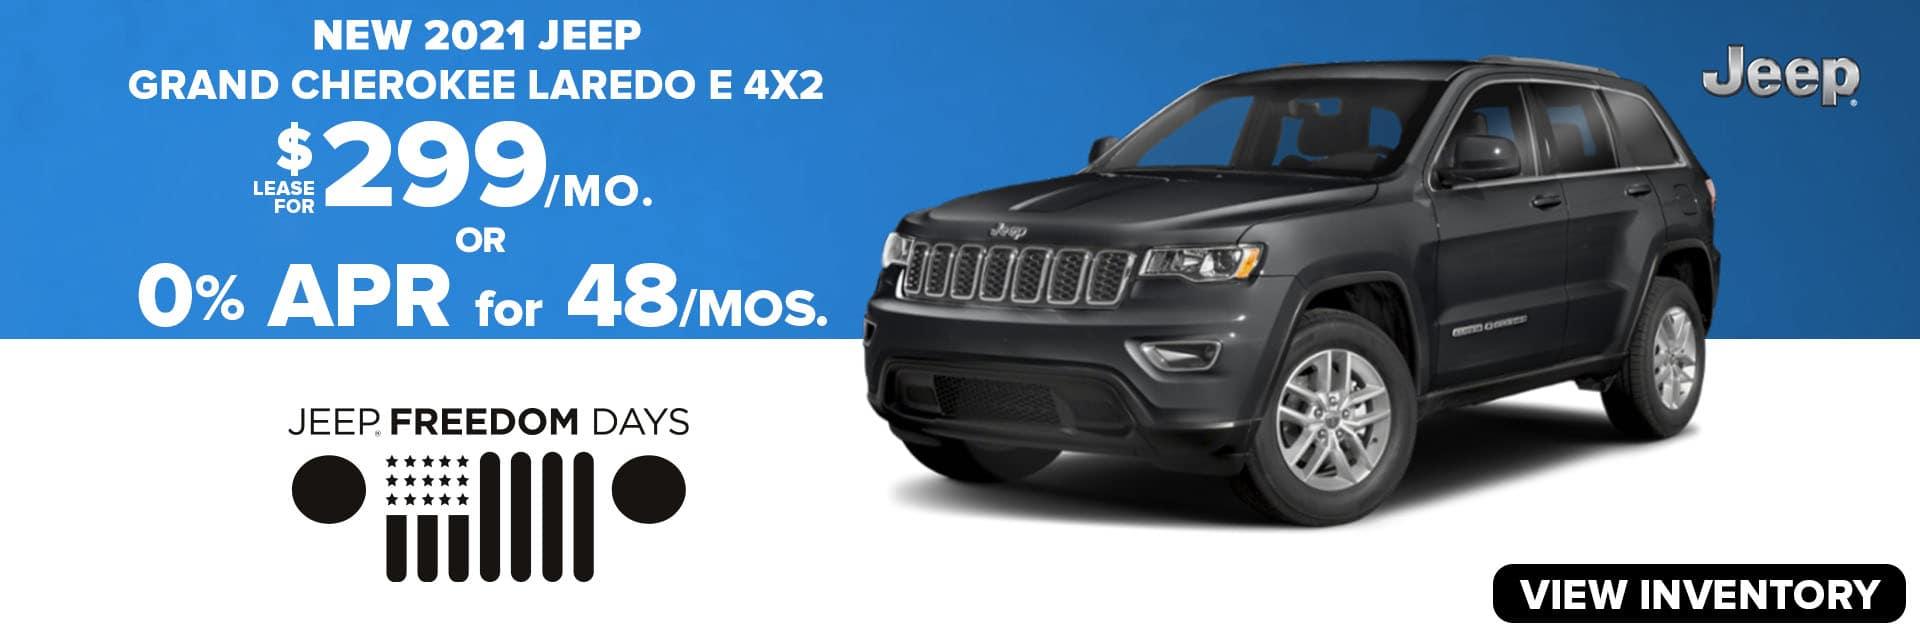 CLCP-June 2021-2021 Jeep Grand Cherokee copy